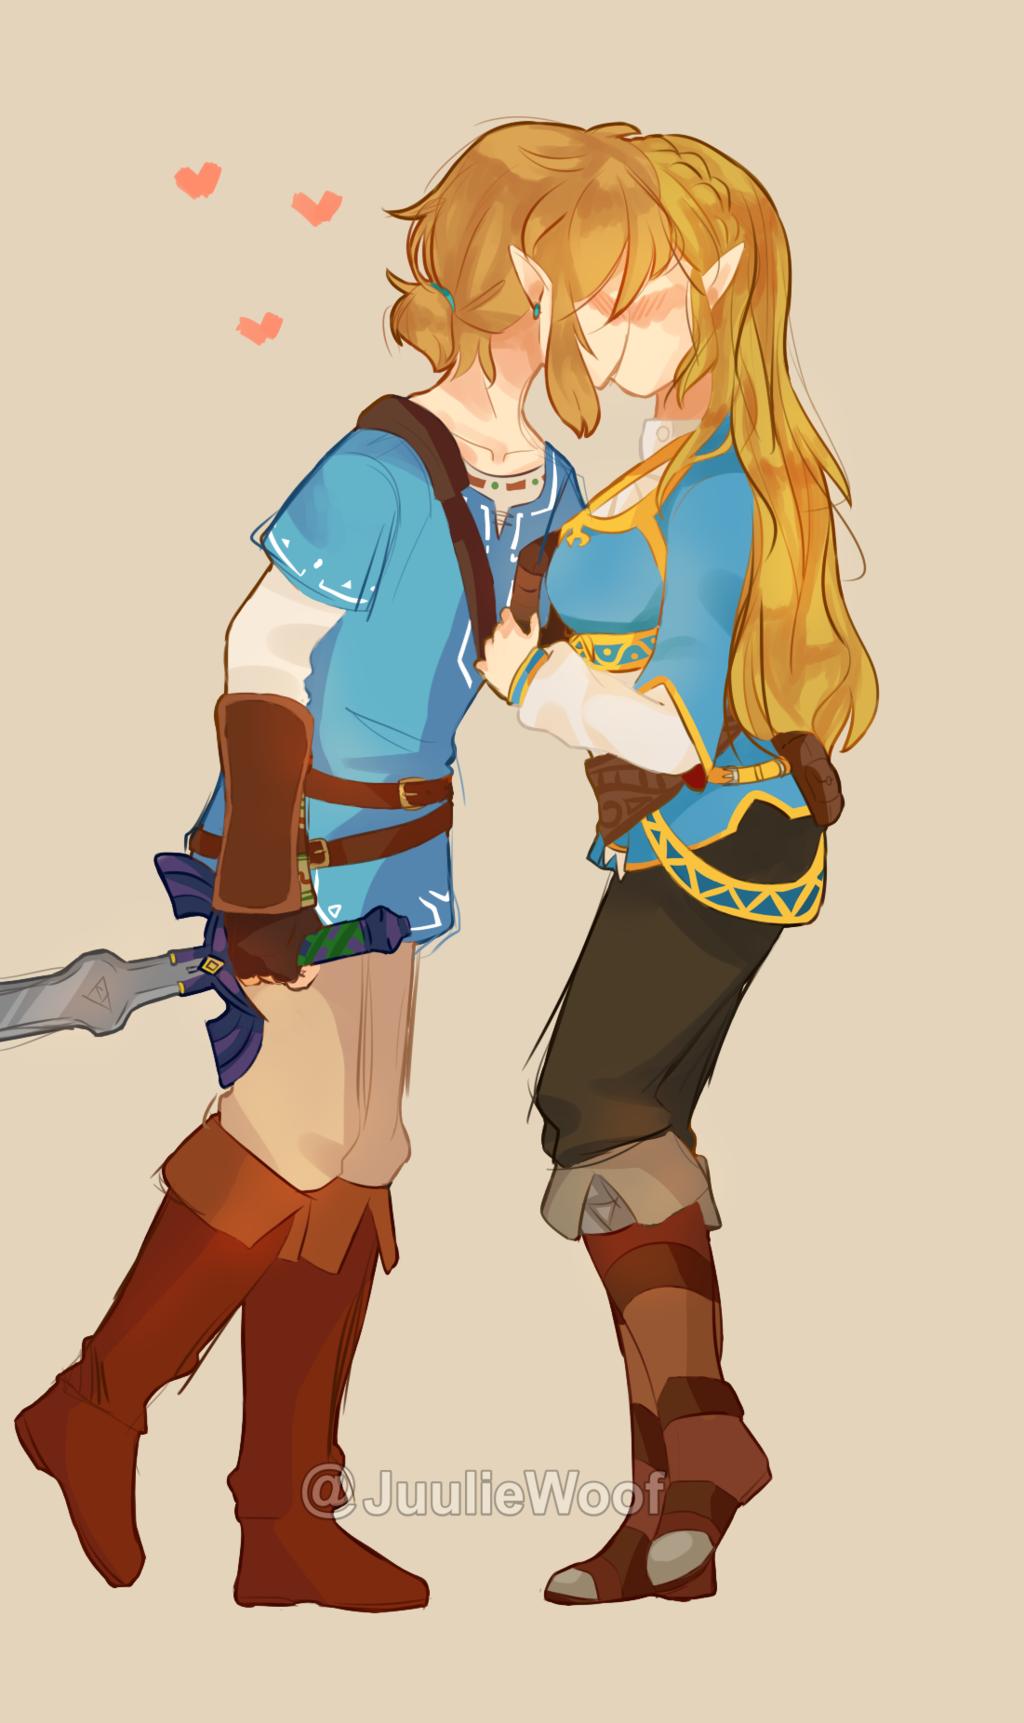 Breath Of The Wil Zelink By Juuliewoof Legend Of Zelda